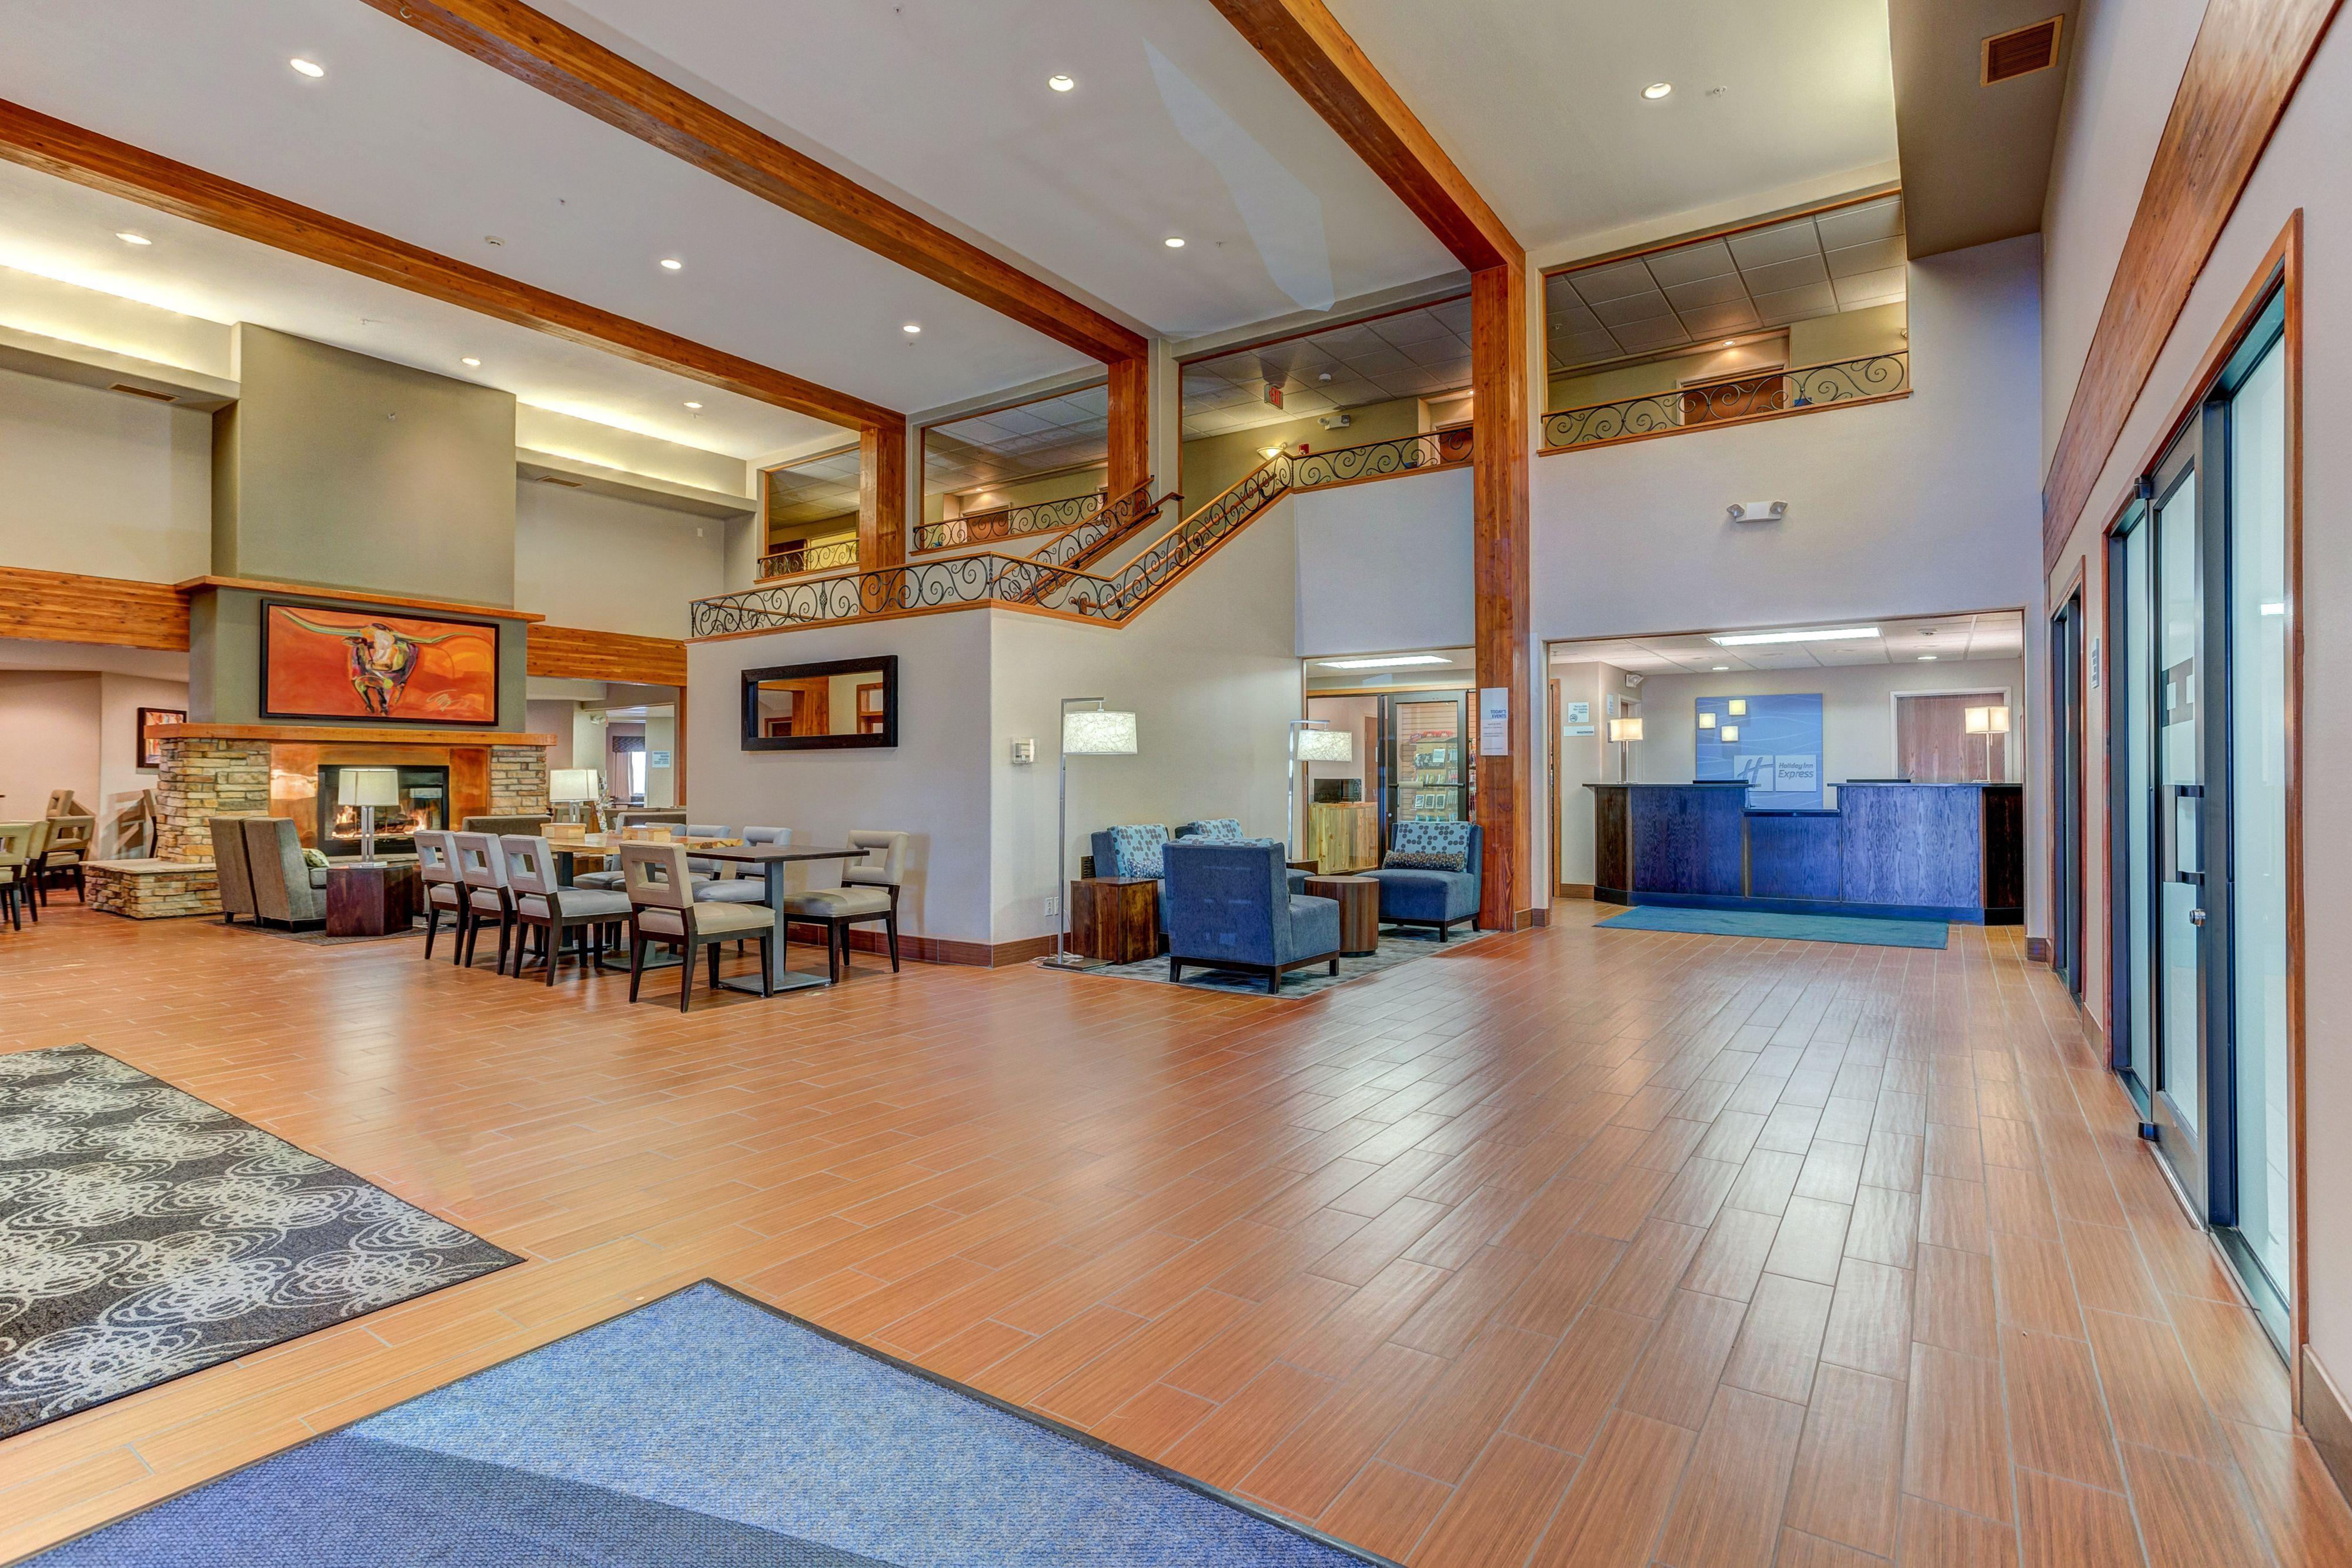 Holiday Inn Express & Suites Montrose image 3